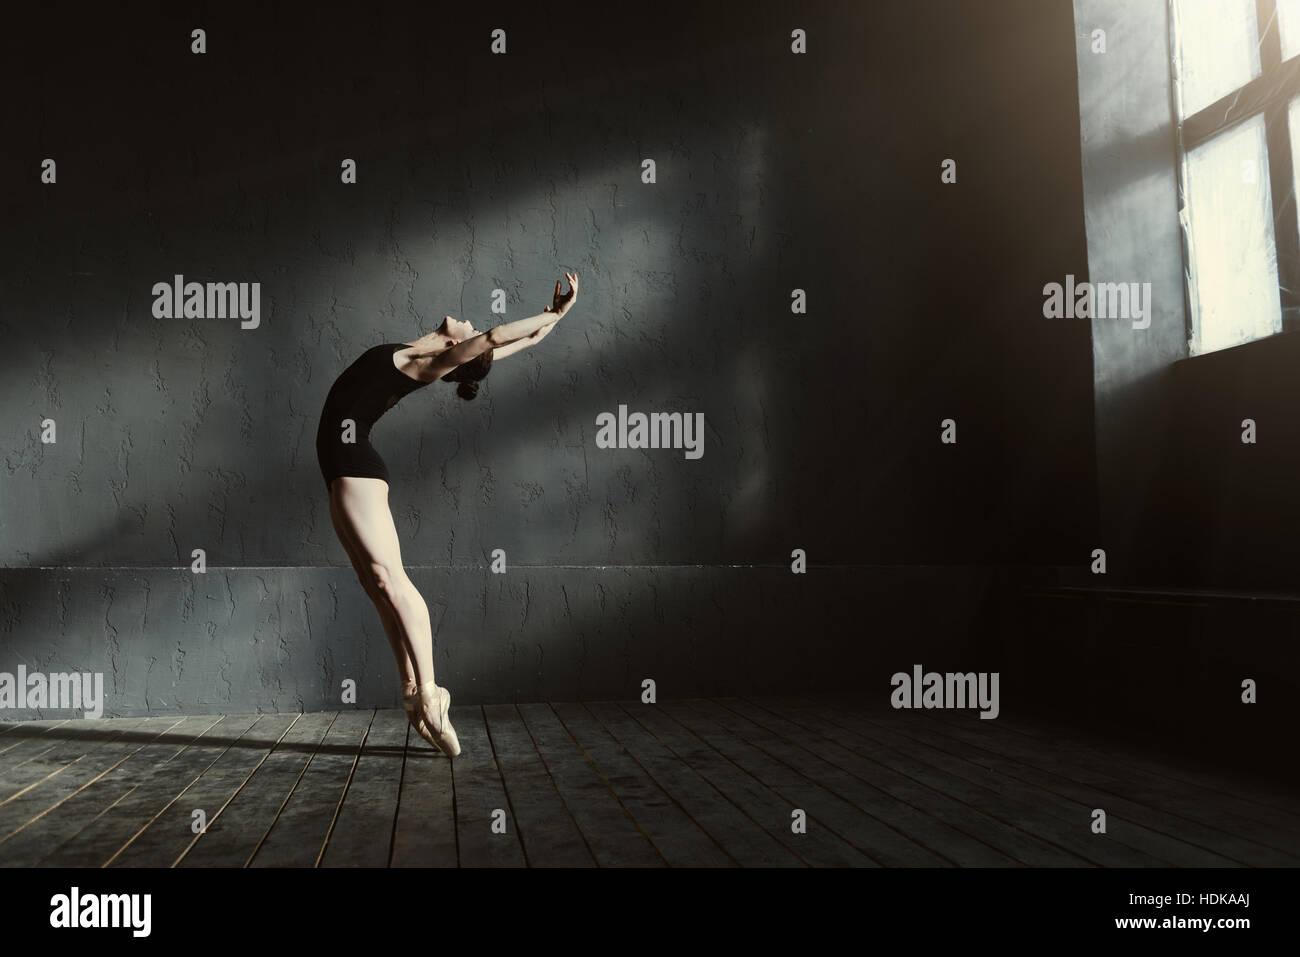 Flexible ballet dancer stretching in the dark lighted studio - Stock Image